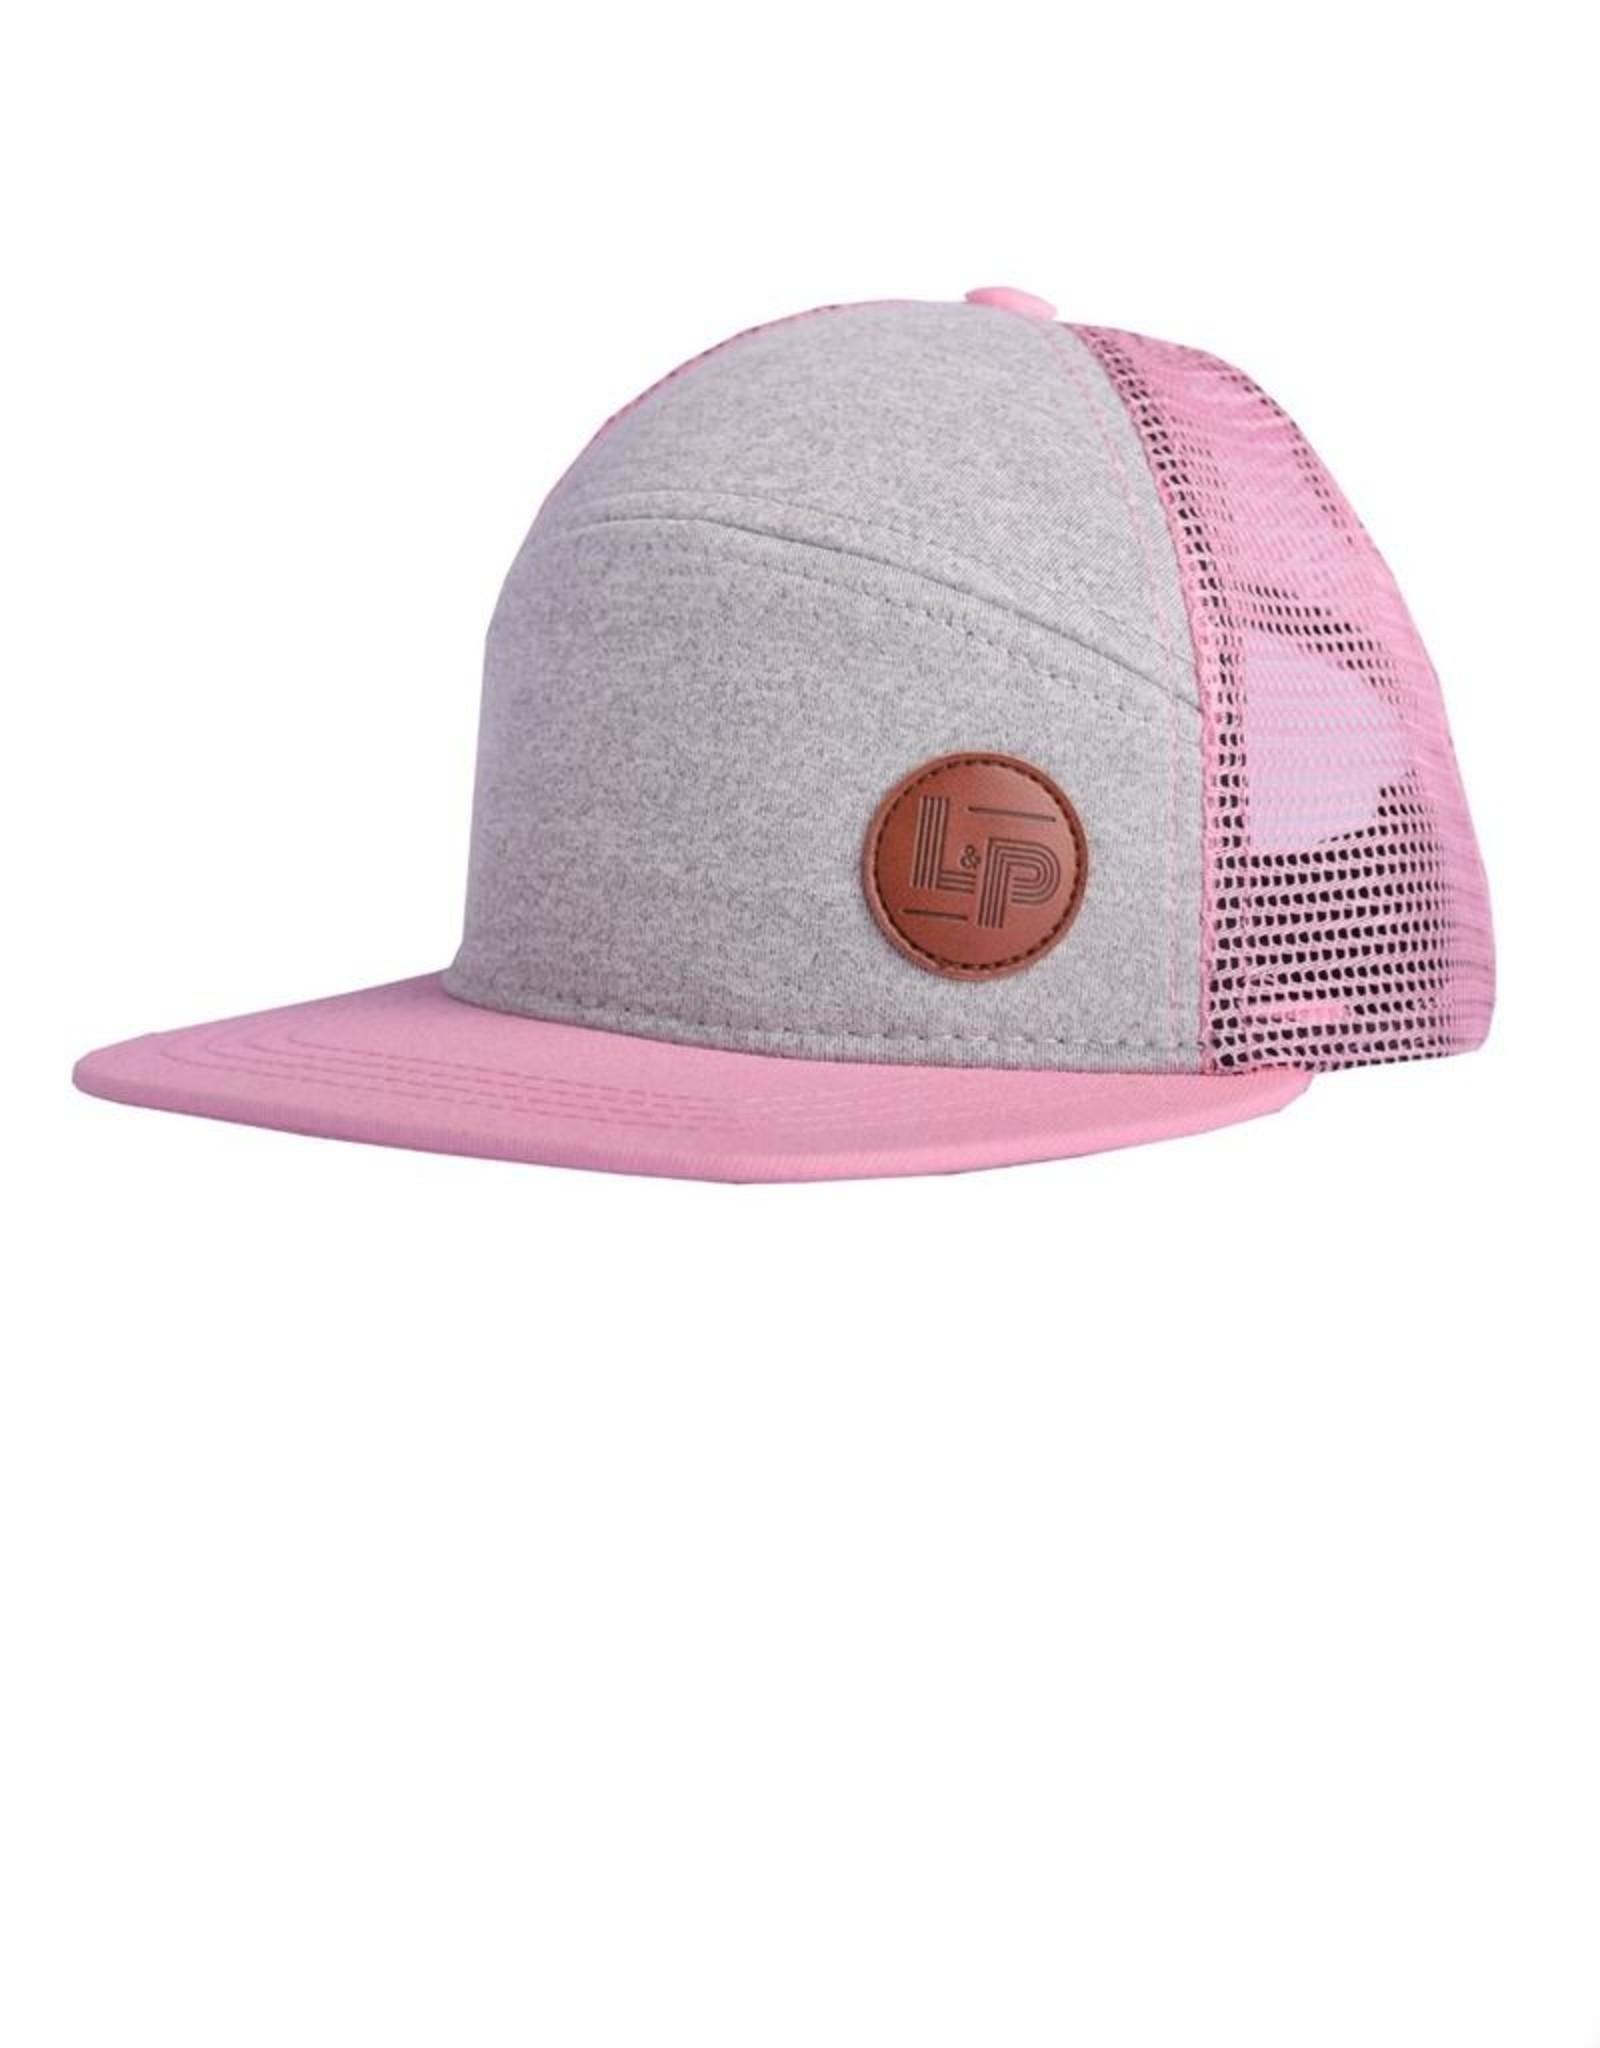 L&P Apparel Sweetness Pink Orleans Snapback Girls Cap